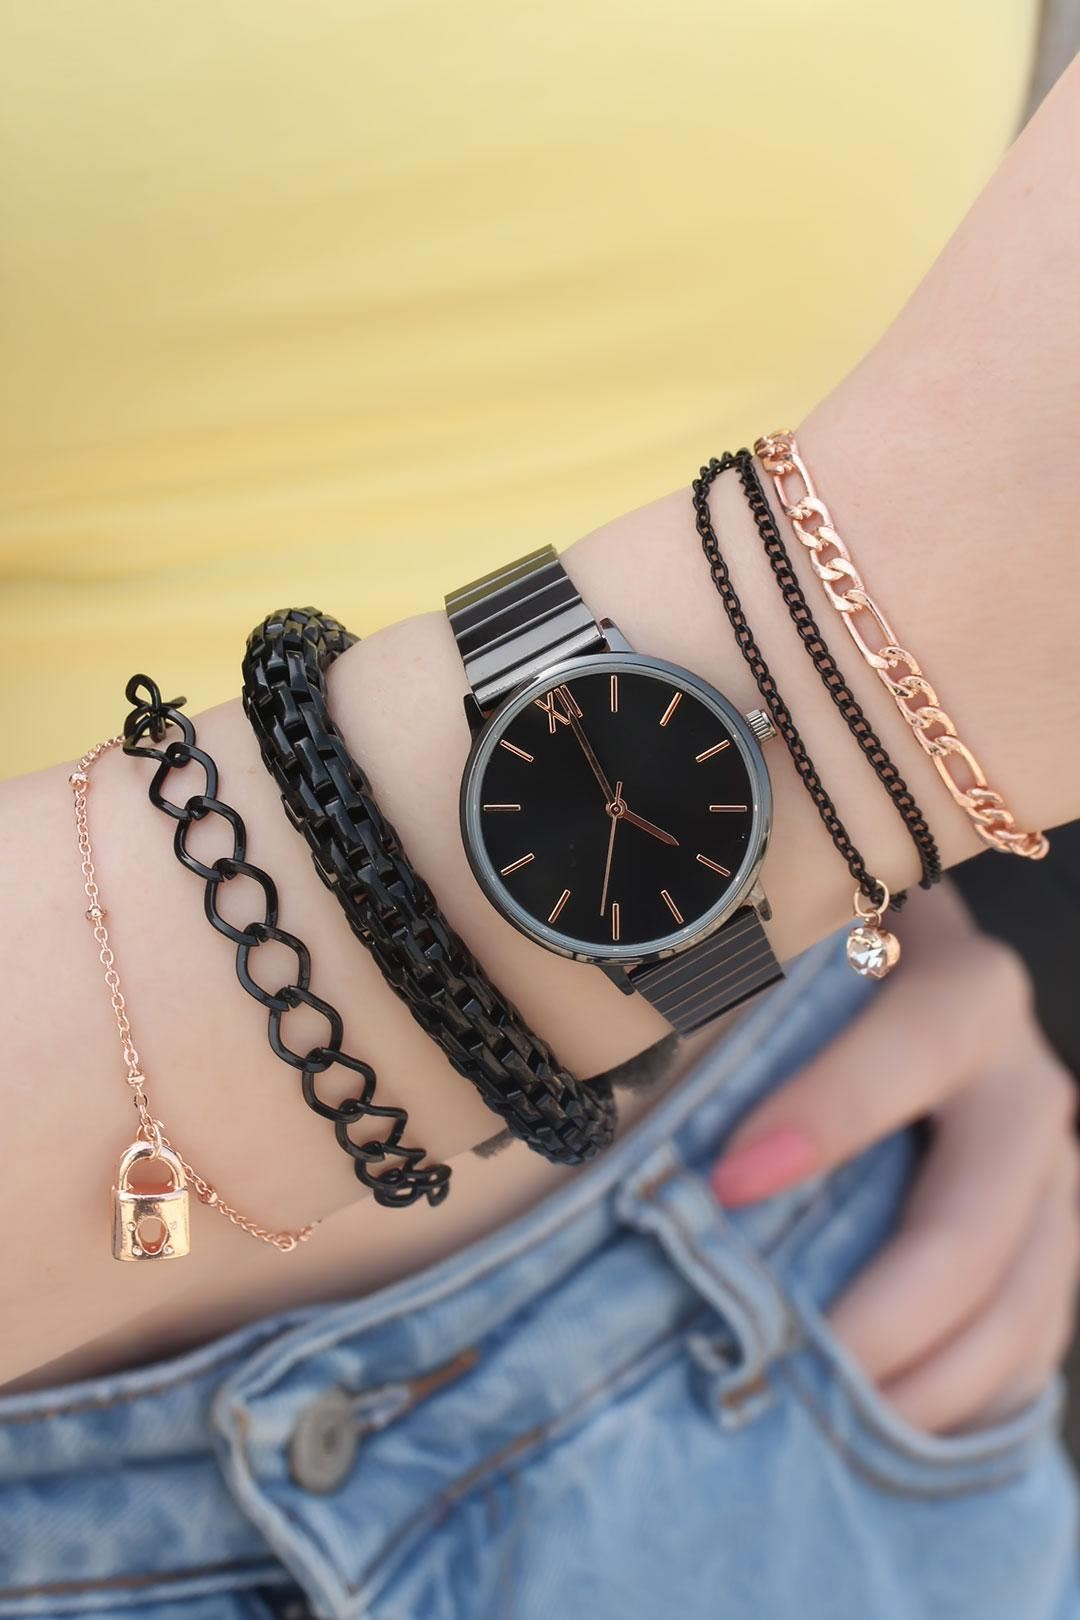 Siyah Renk Metal Kordonlu Saat ve Bileklik Kombini